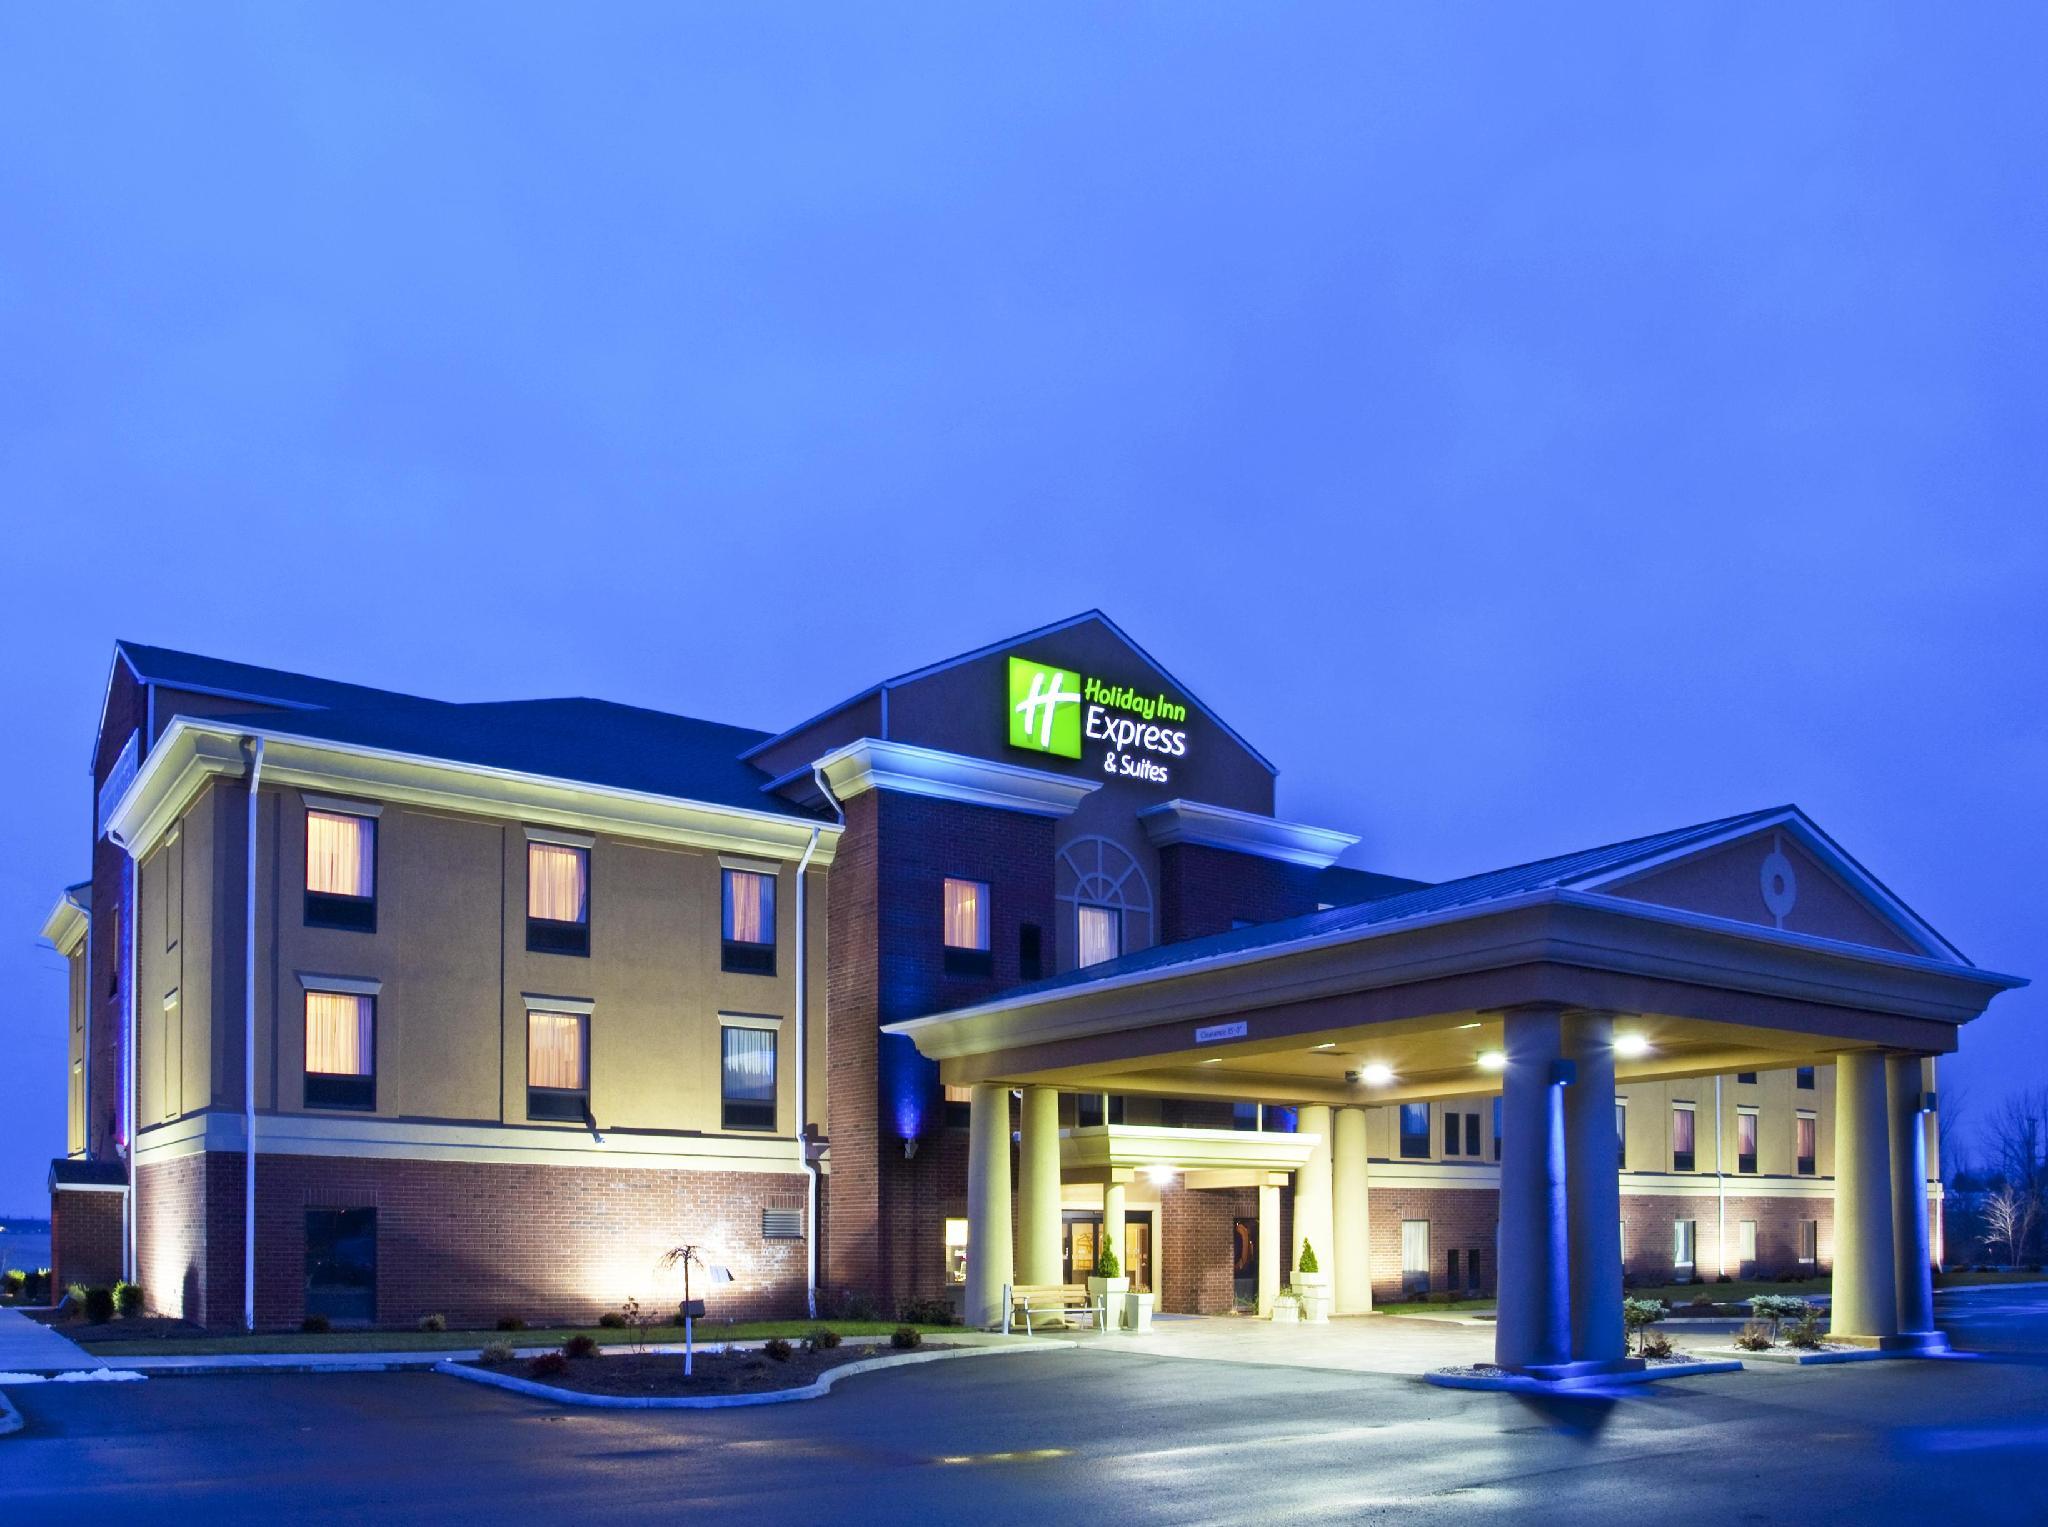 Holiday Inn Express Hotel And Suites Van Wert